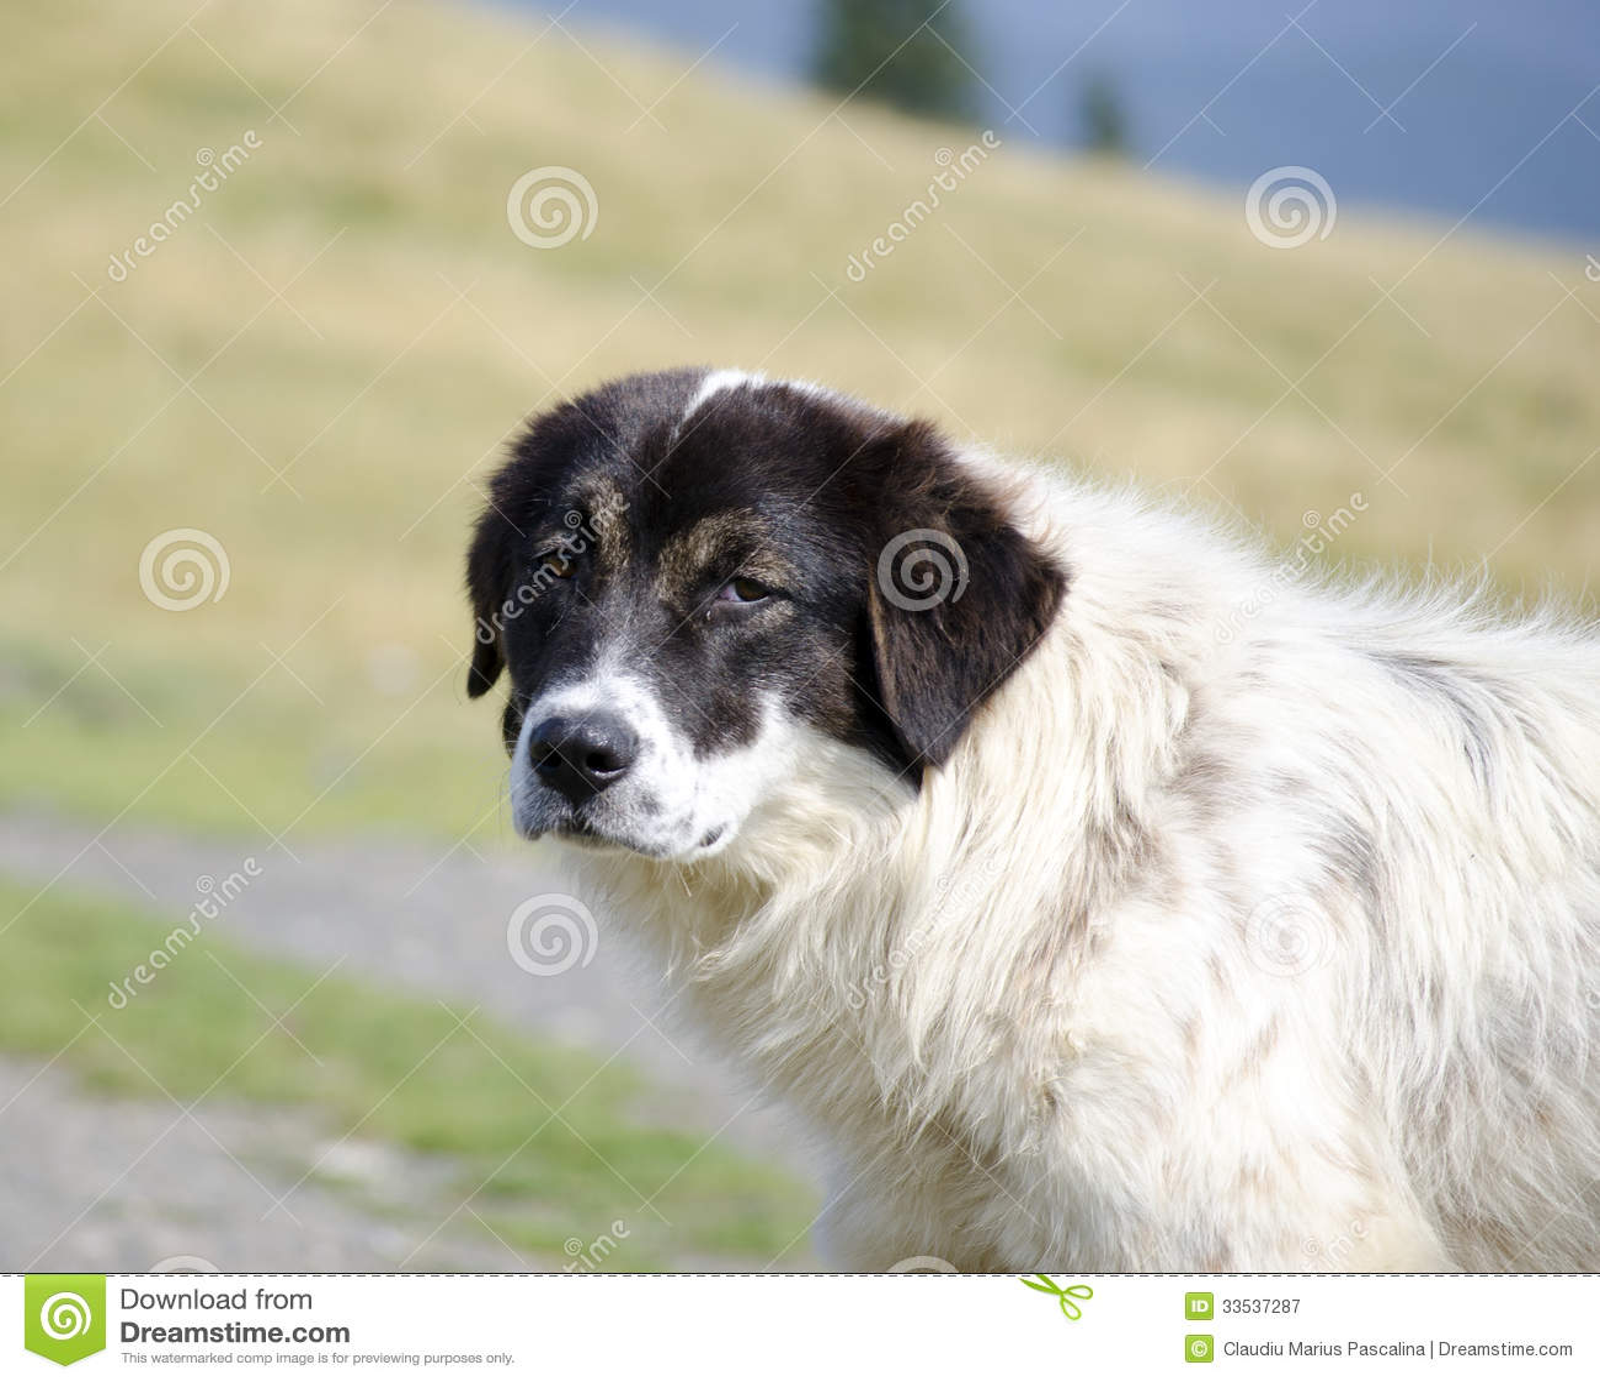 Romanian Sheep Dog Royalty Free Stock Photography - Image: 33537287